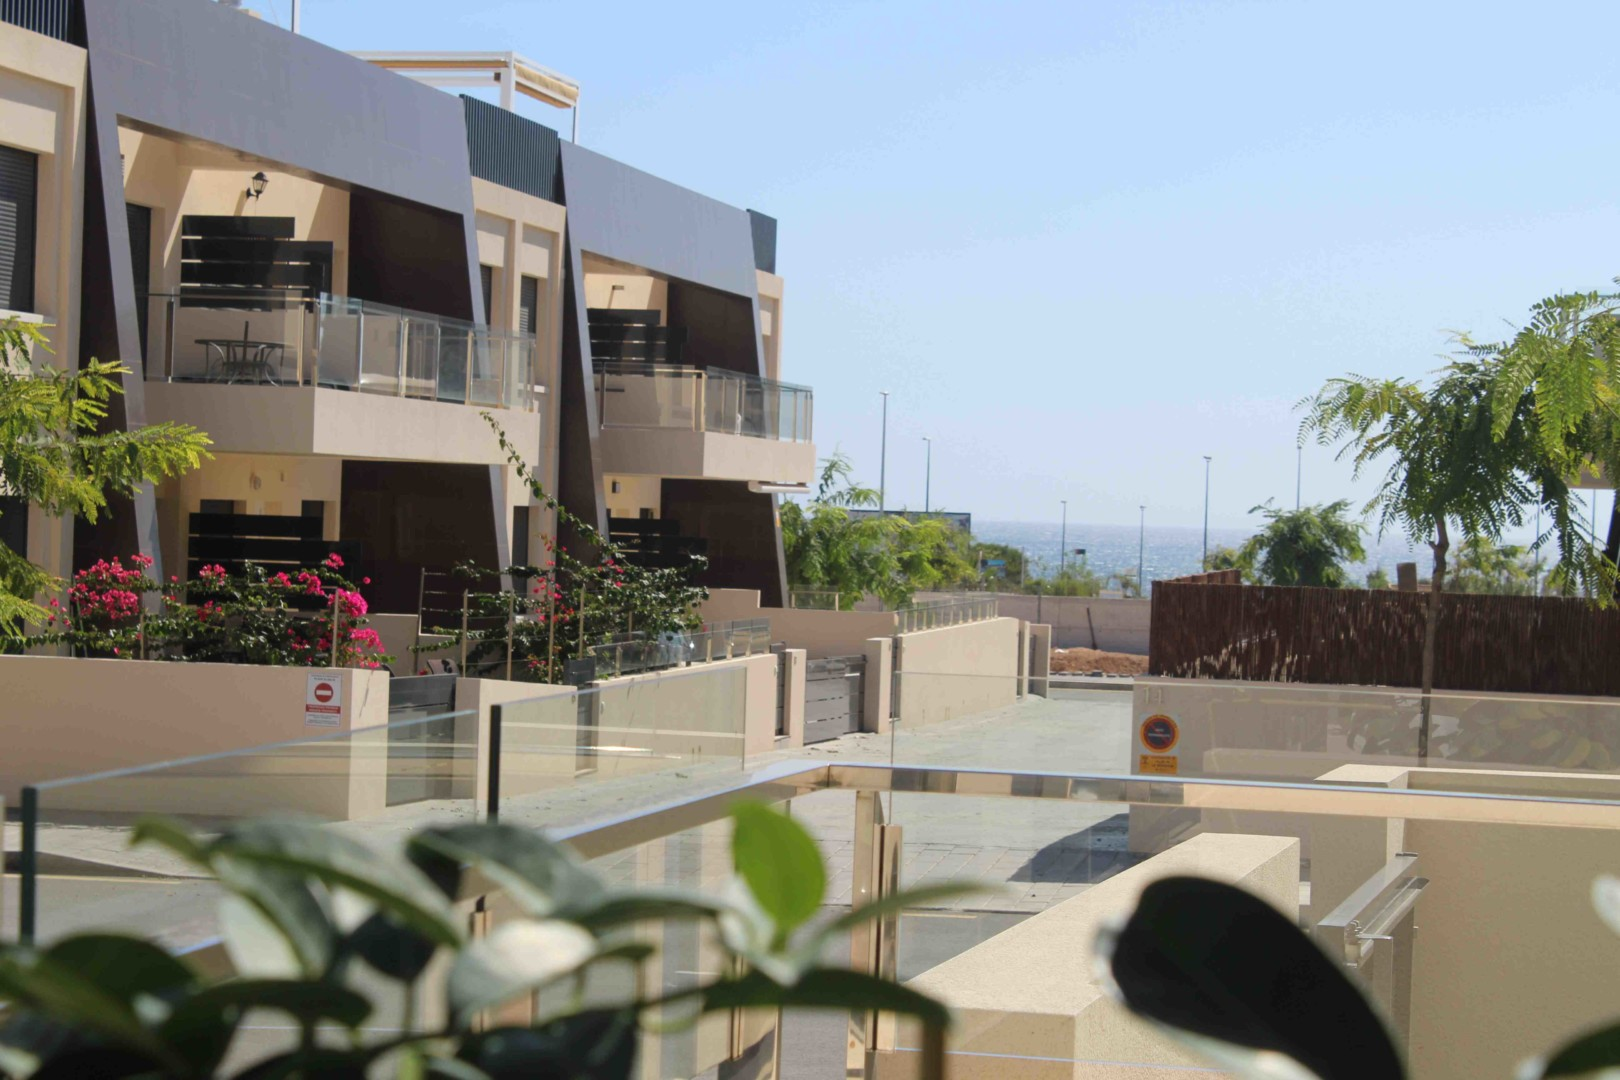 Maravilloso Bungalow planta baja con piscina